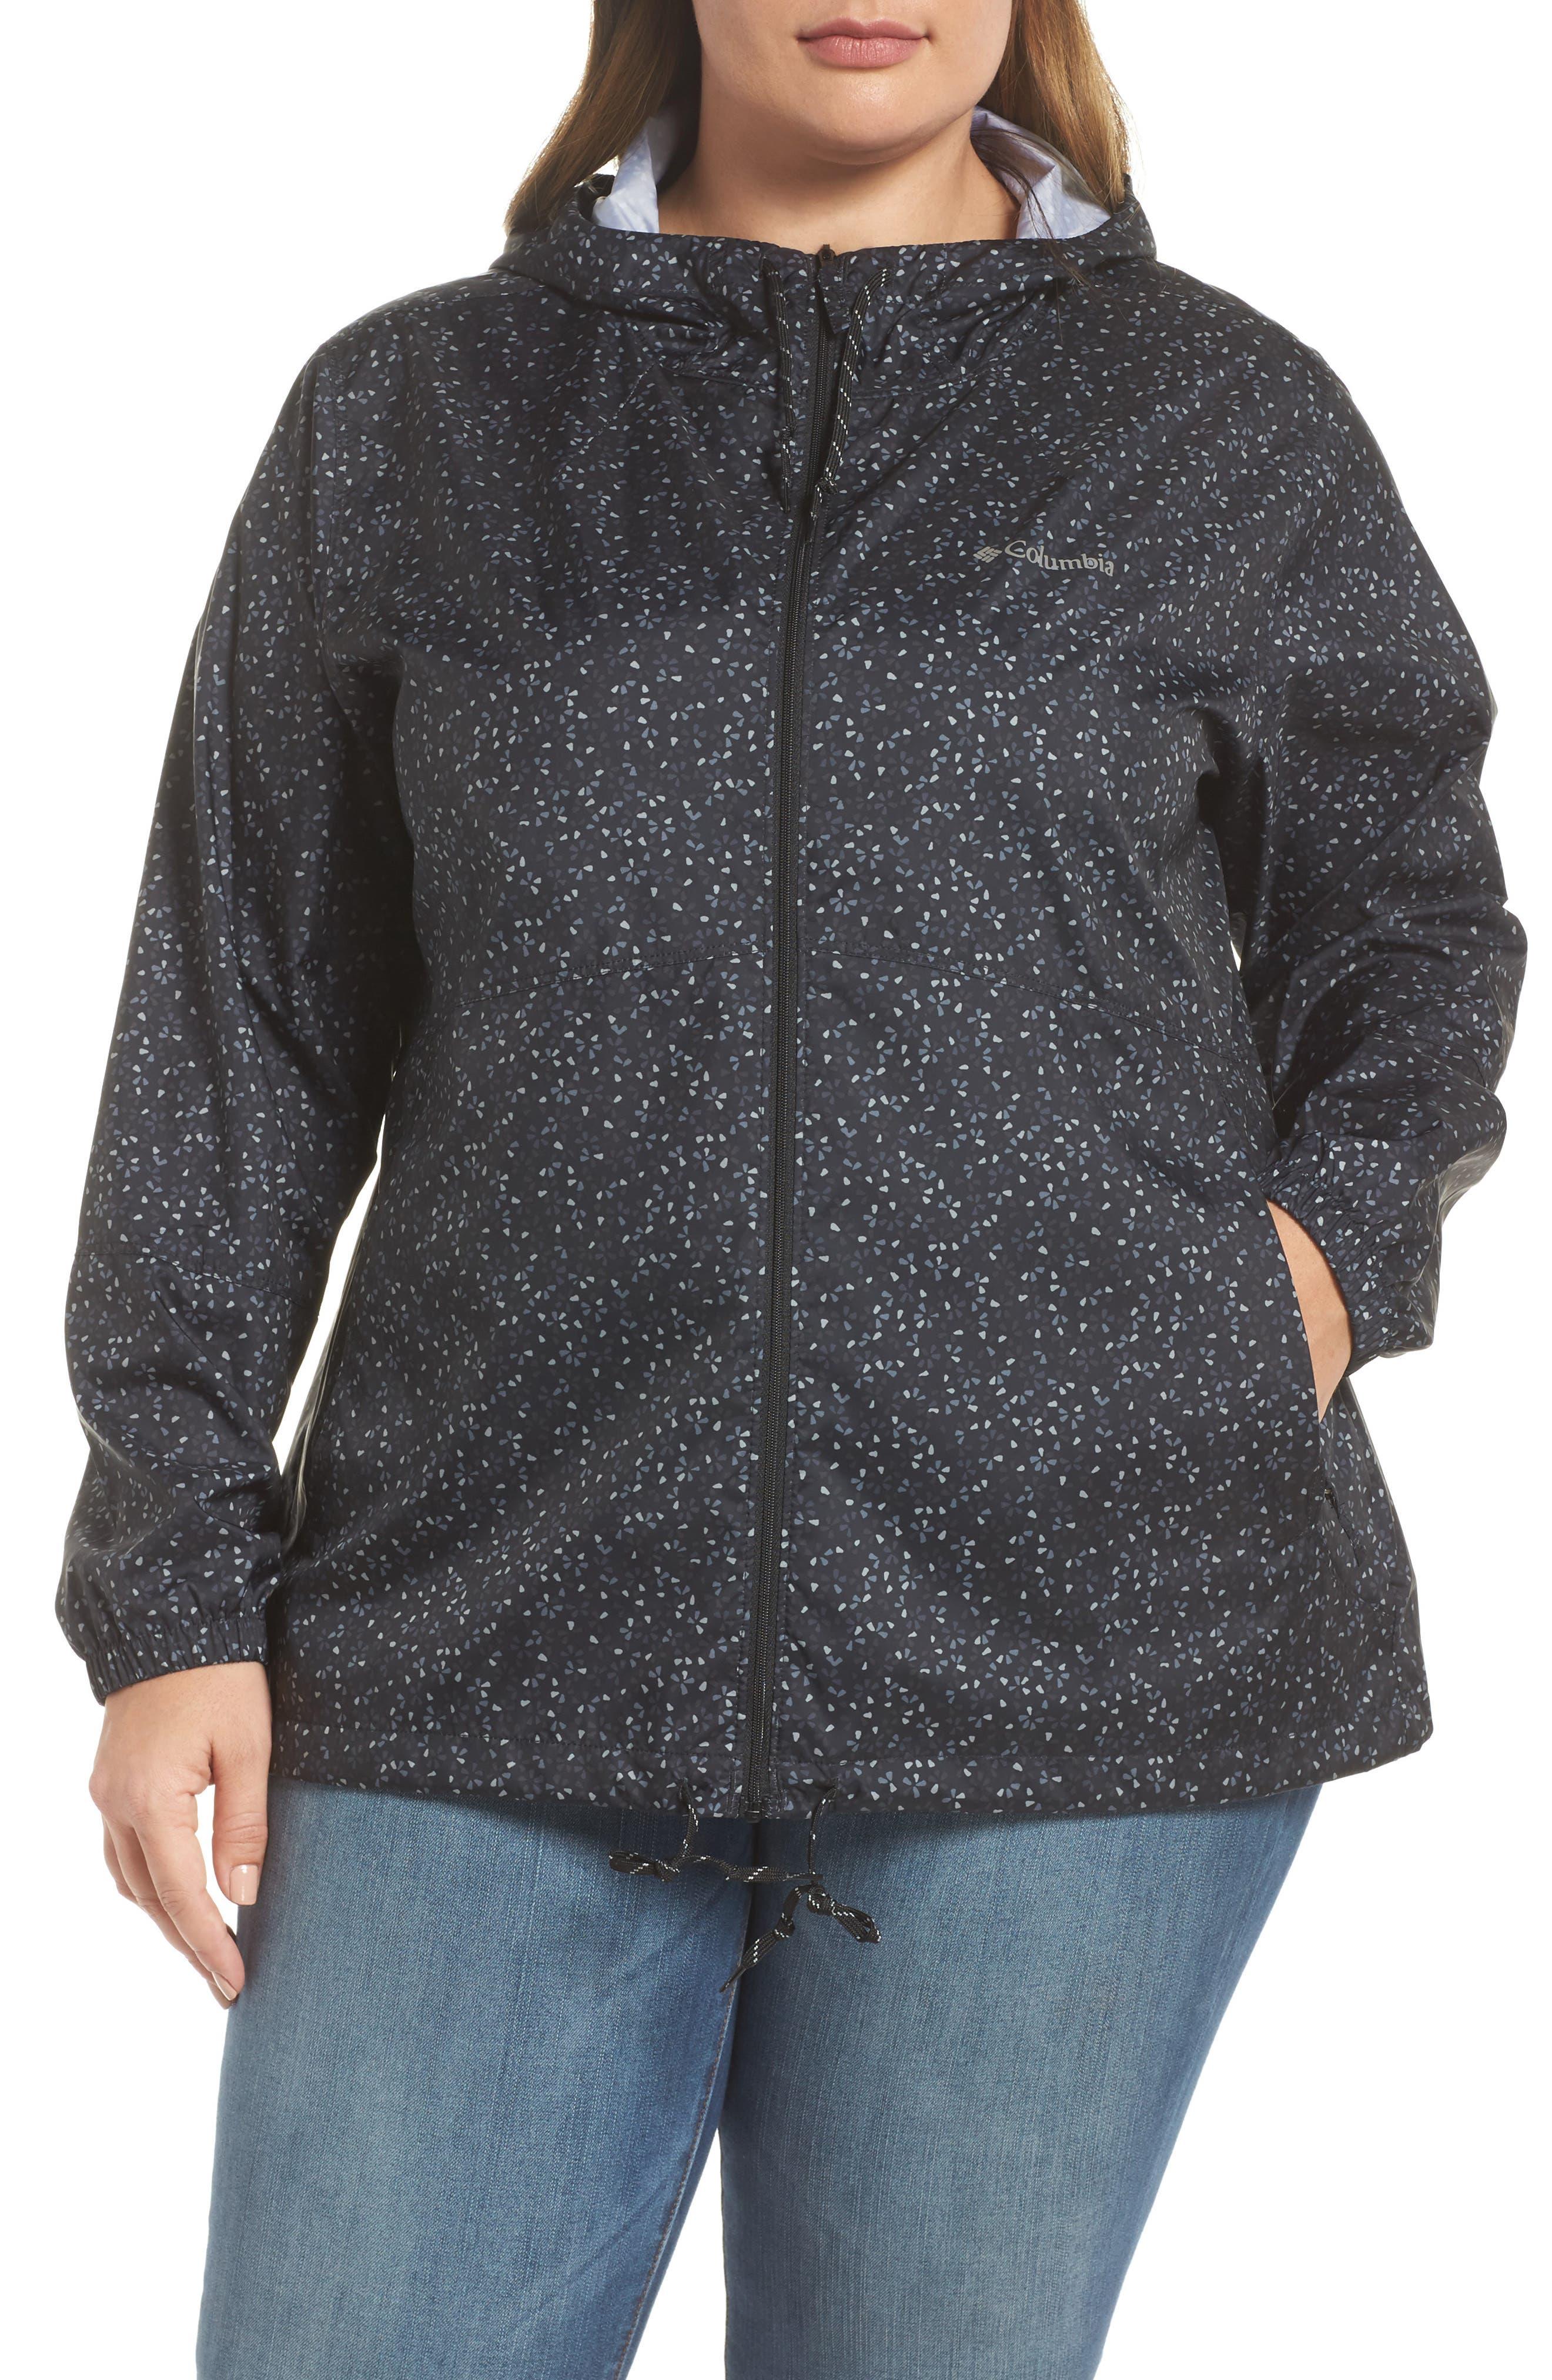 Flash Forward Print Hooded Jacket,                             Alternate thumbnail 4, color,                             Black Print